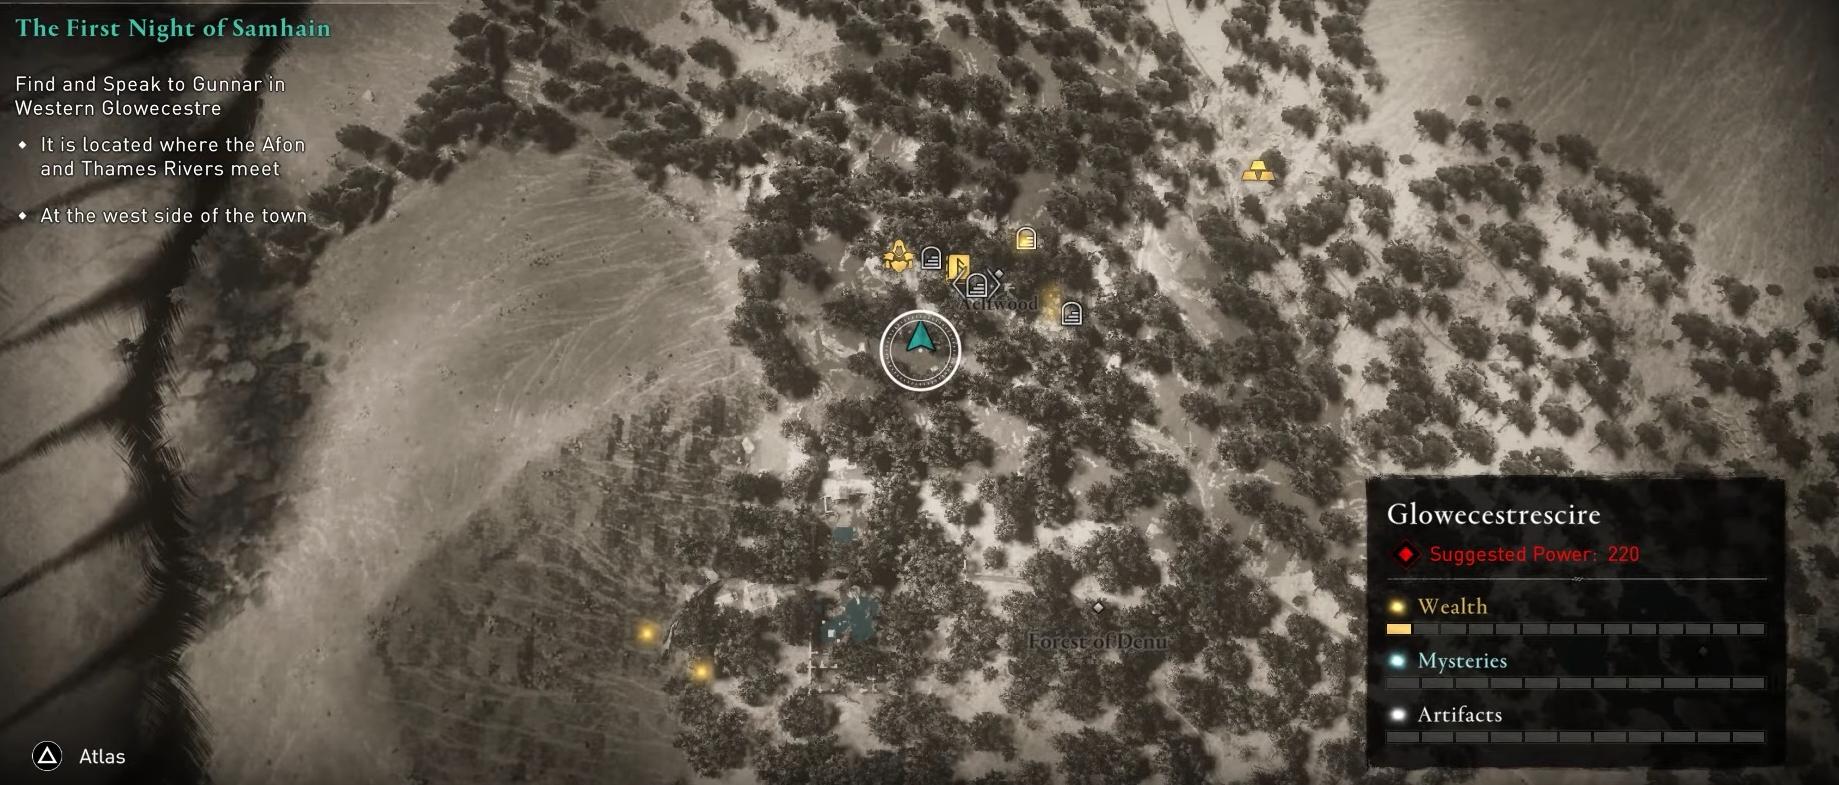 Assassin's Creed Valhalla Abilities Upgrade Locations